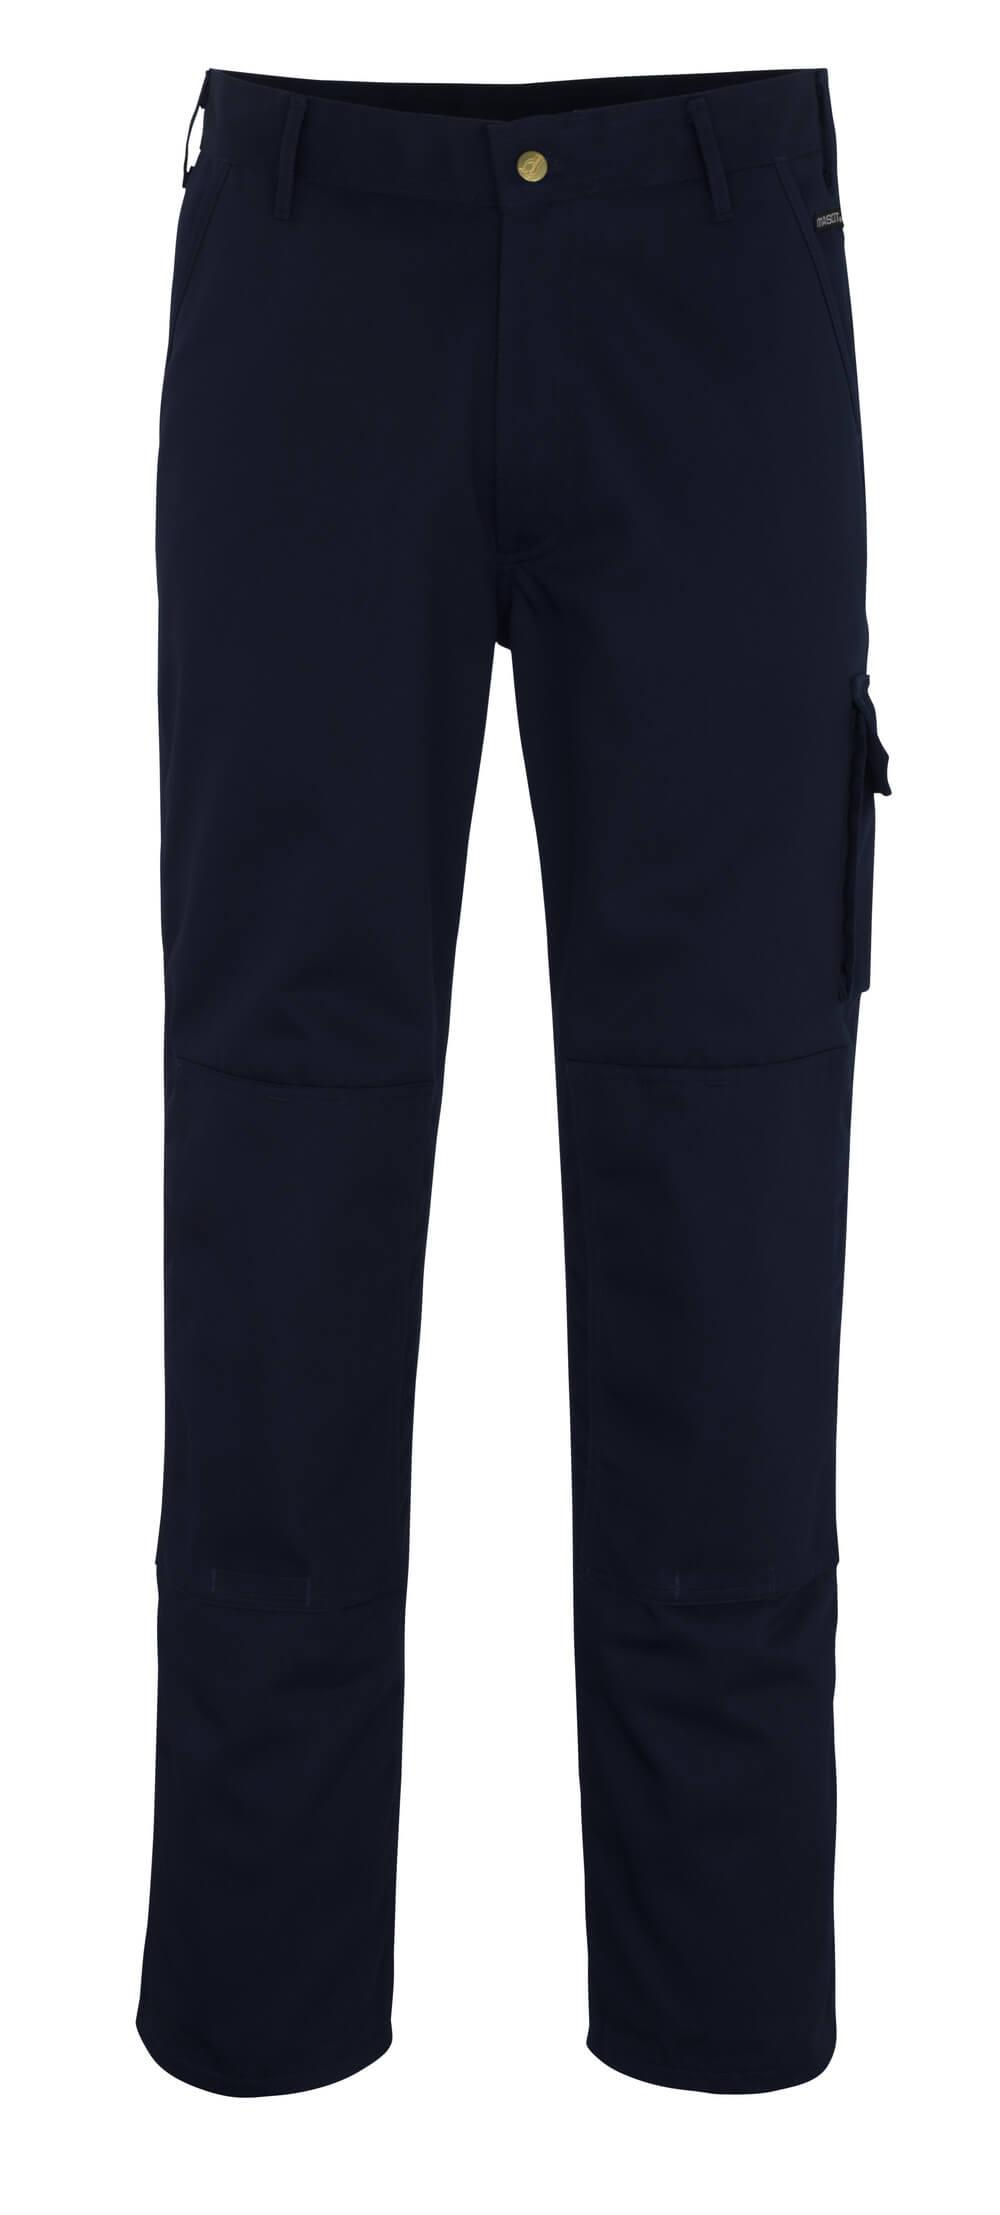 00279-430-01 Pantalon avec poches genouillères - Marine